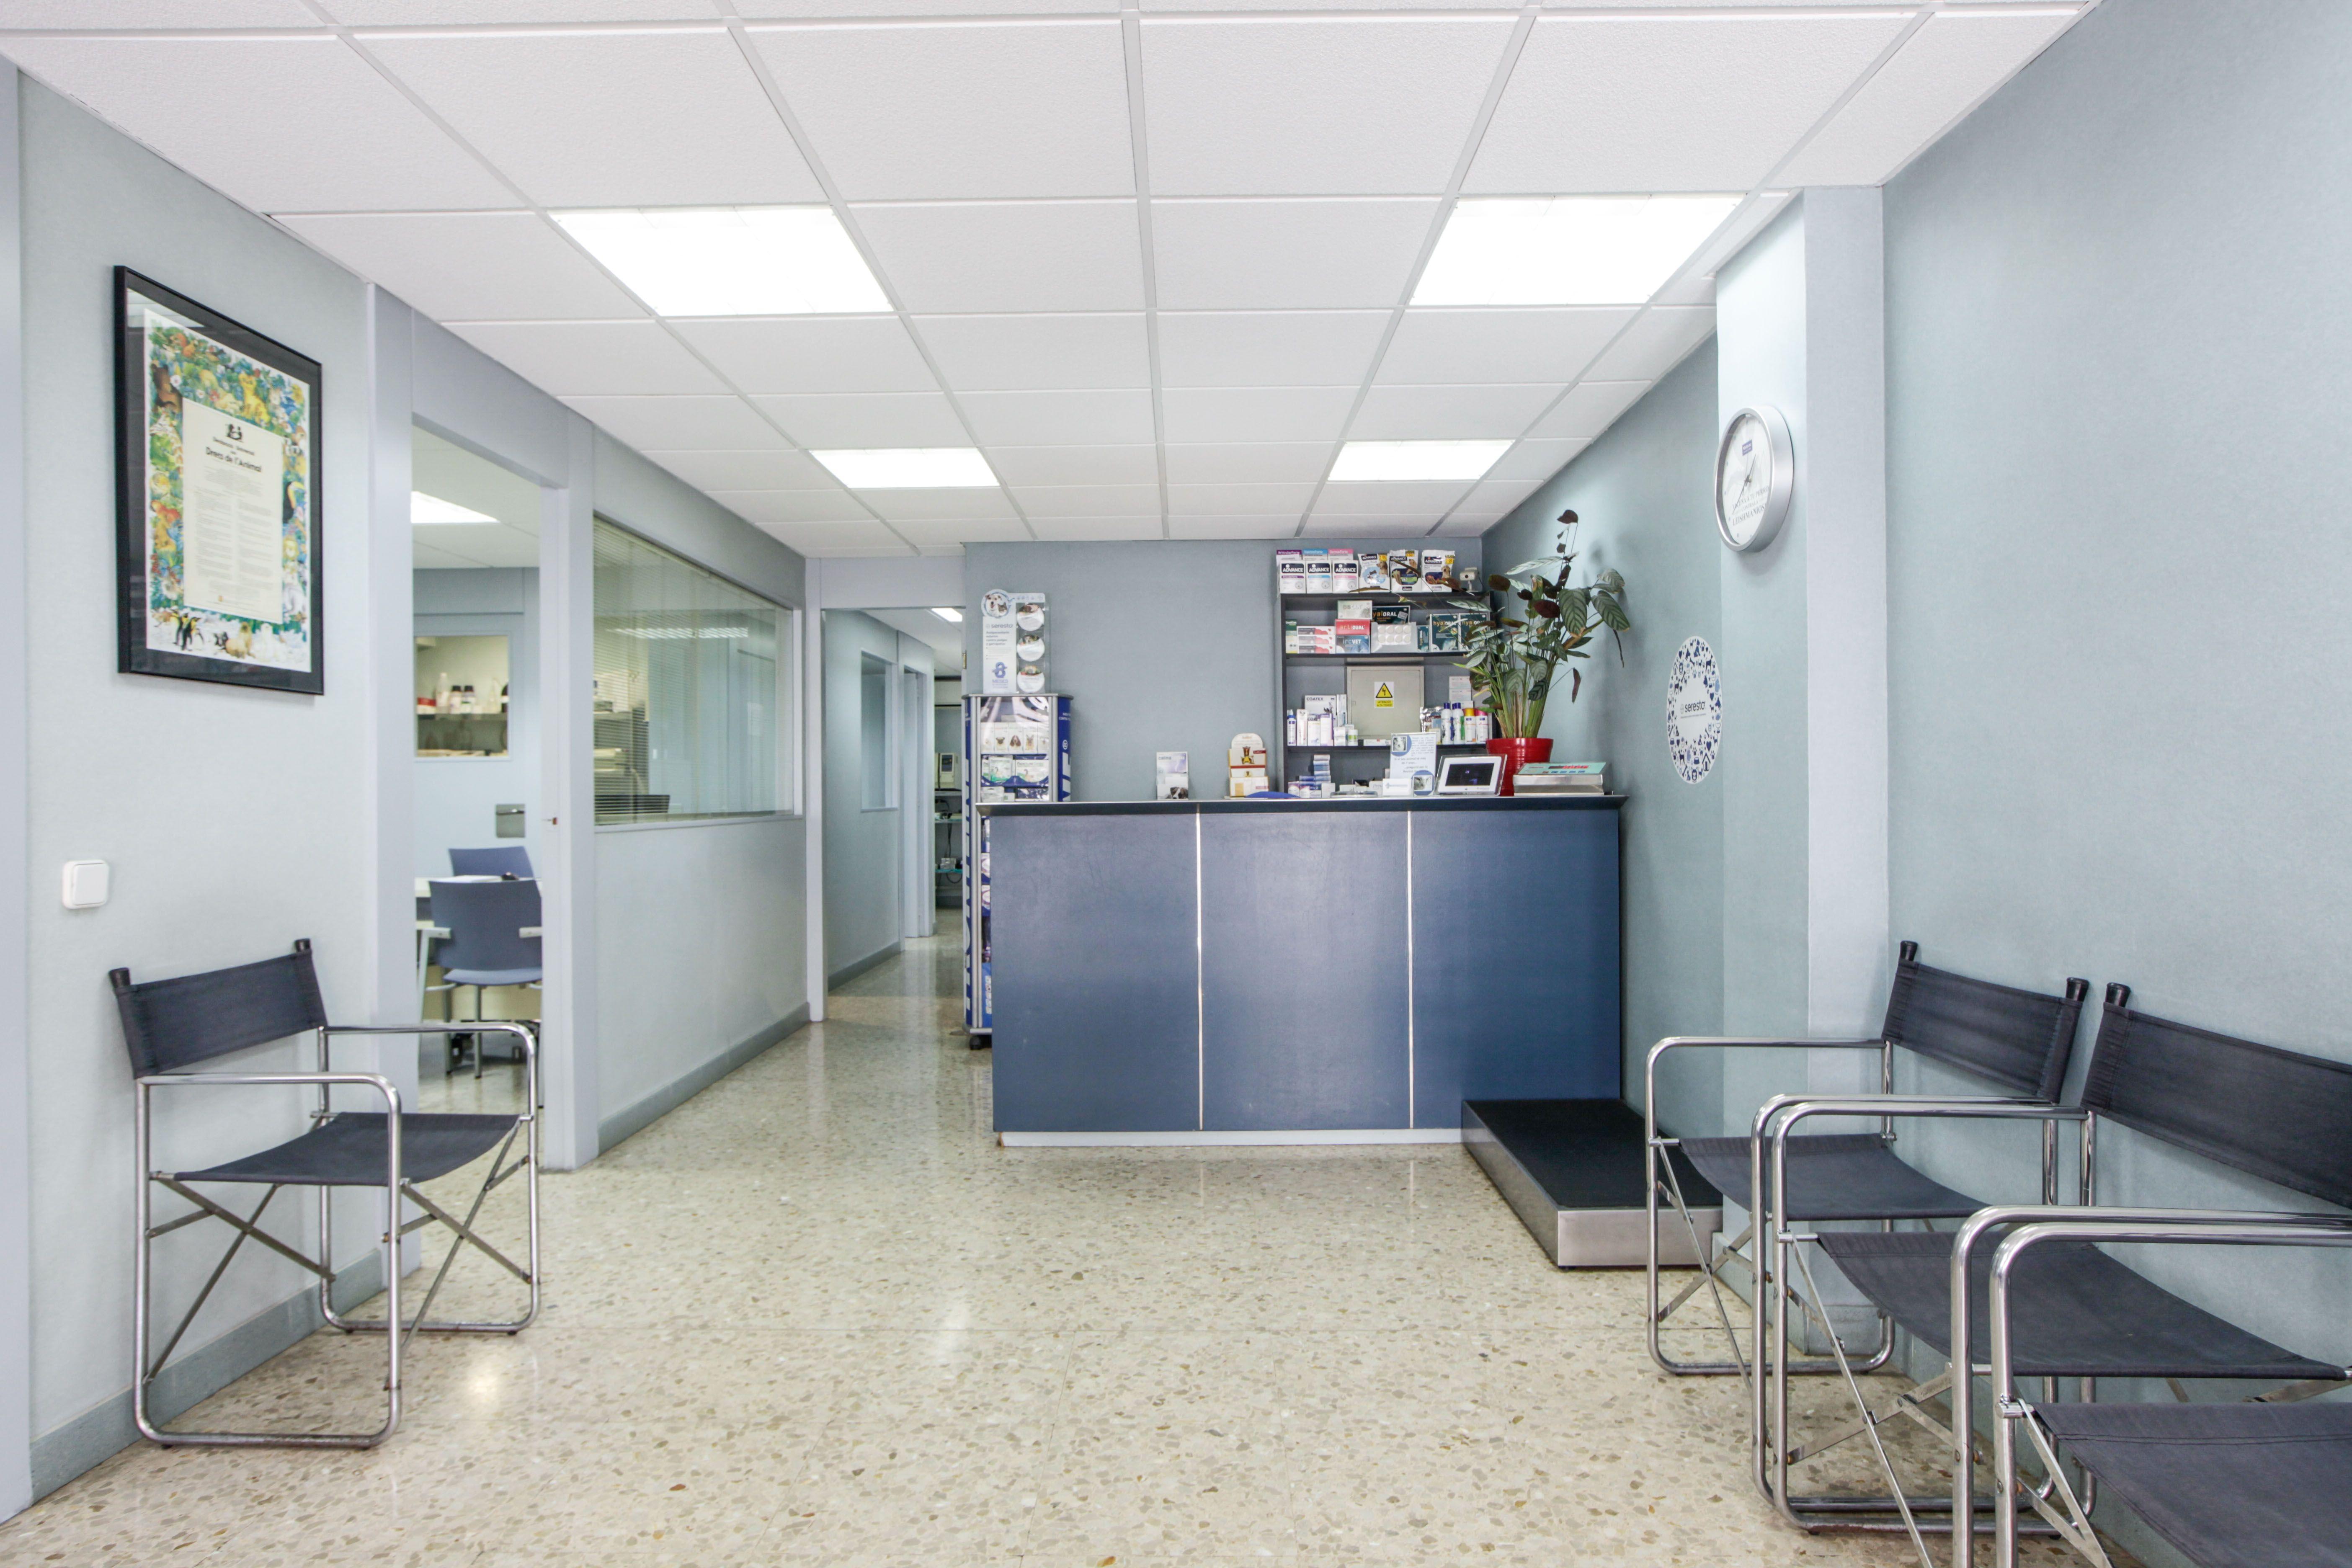 Foto 3 de Veterinarios en Sant Feliu de Llobregat   Centre Veterinari Lacueva Rodrigo